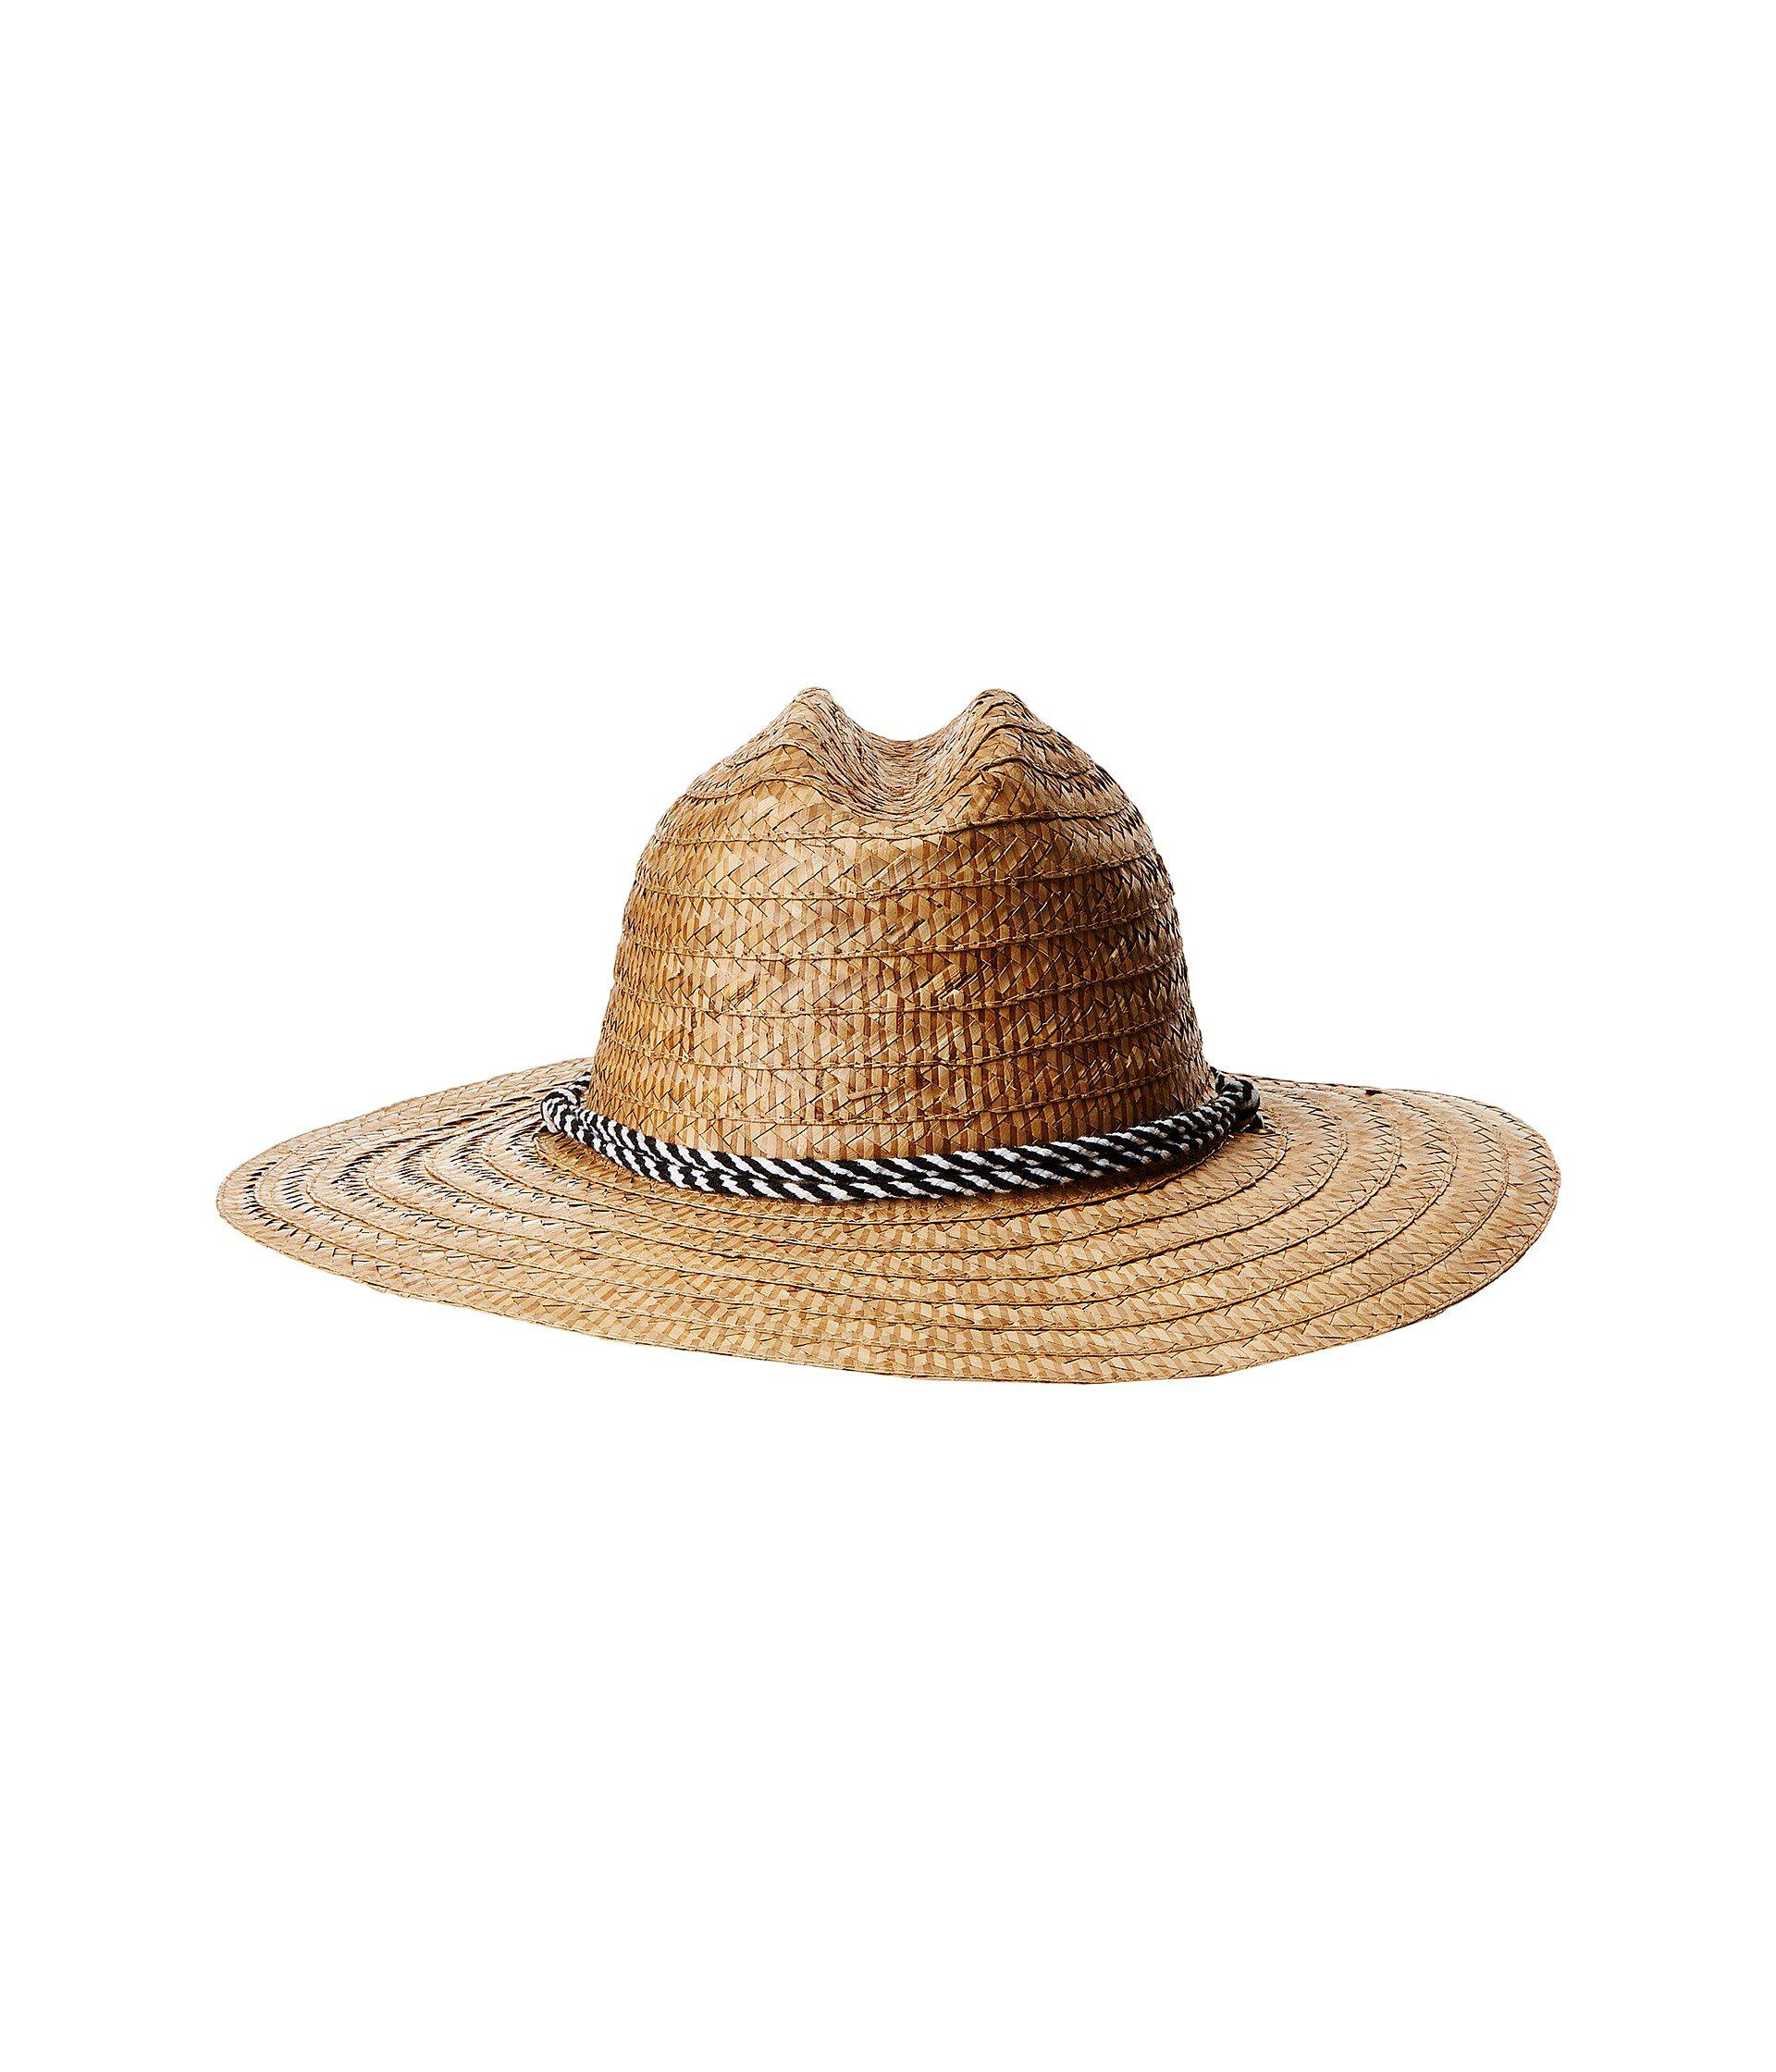 6b5556573bc66 Lyst - San Diego Hat Company Kwai Braided Straw Lifeguard (natural ...